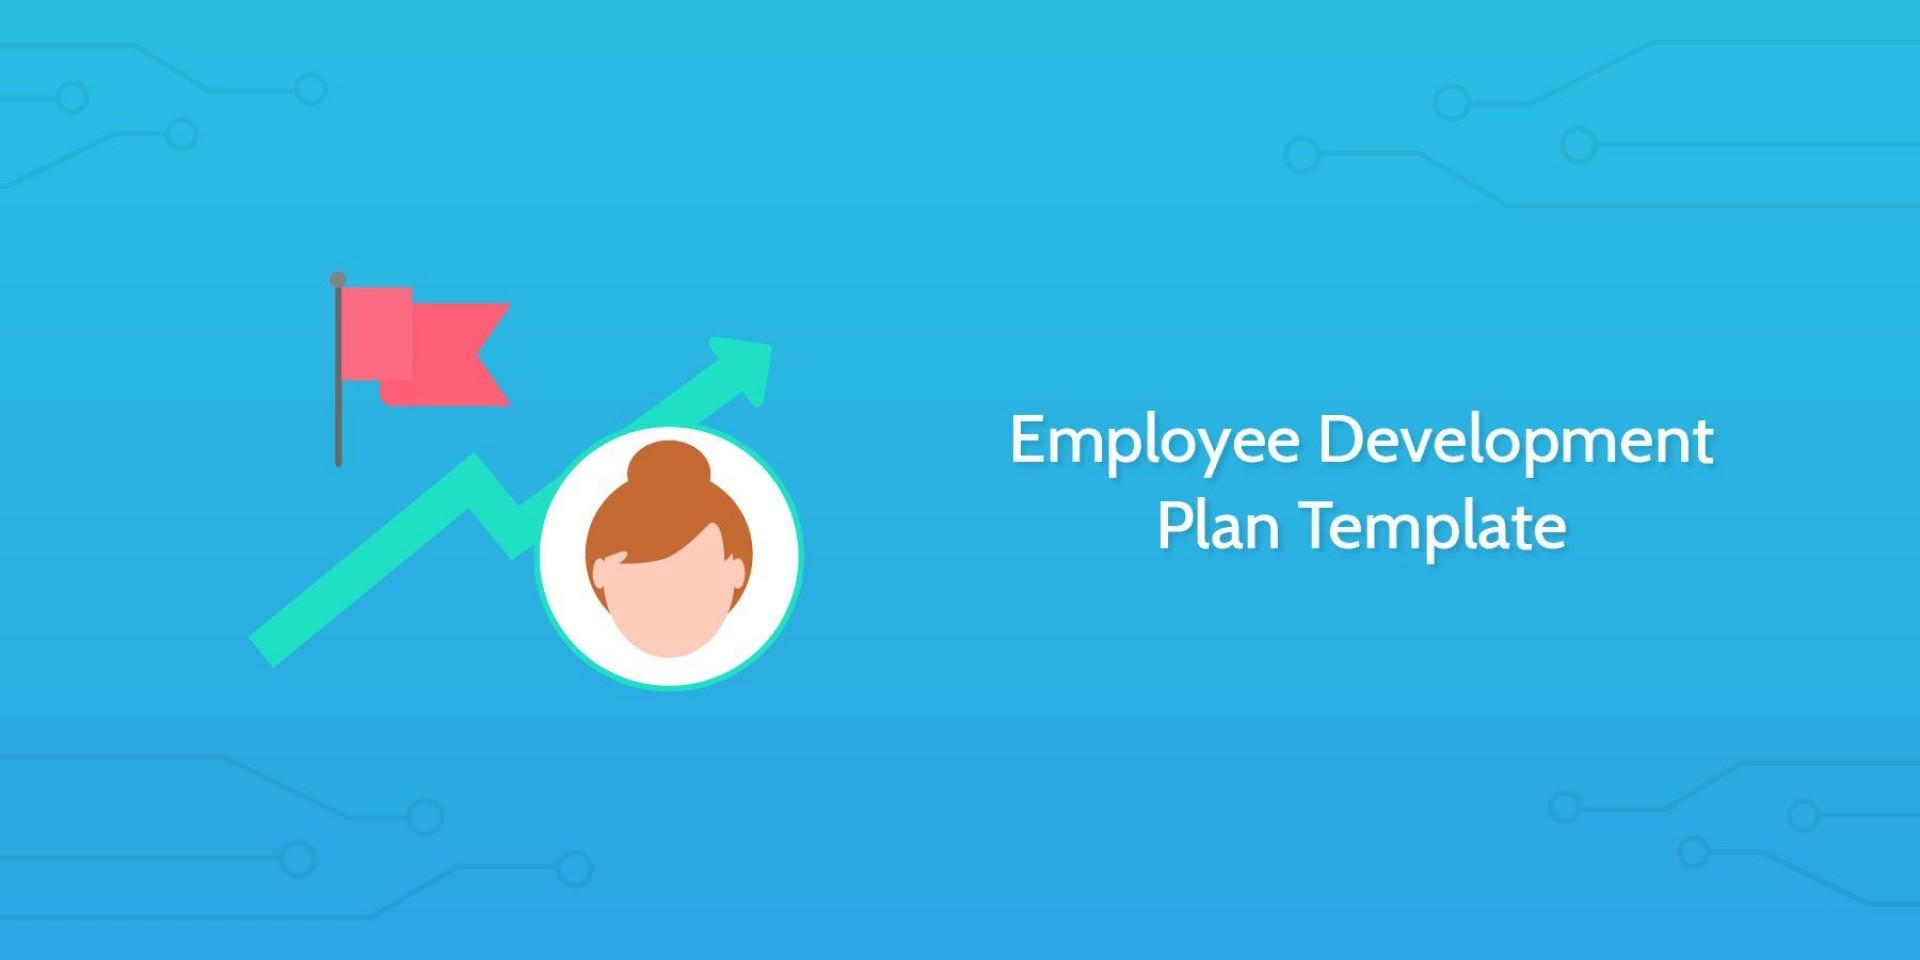 003 Dreaded Employee Development Plan Template Photo  Ppt Free1920